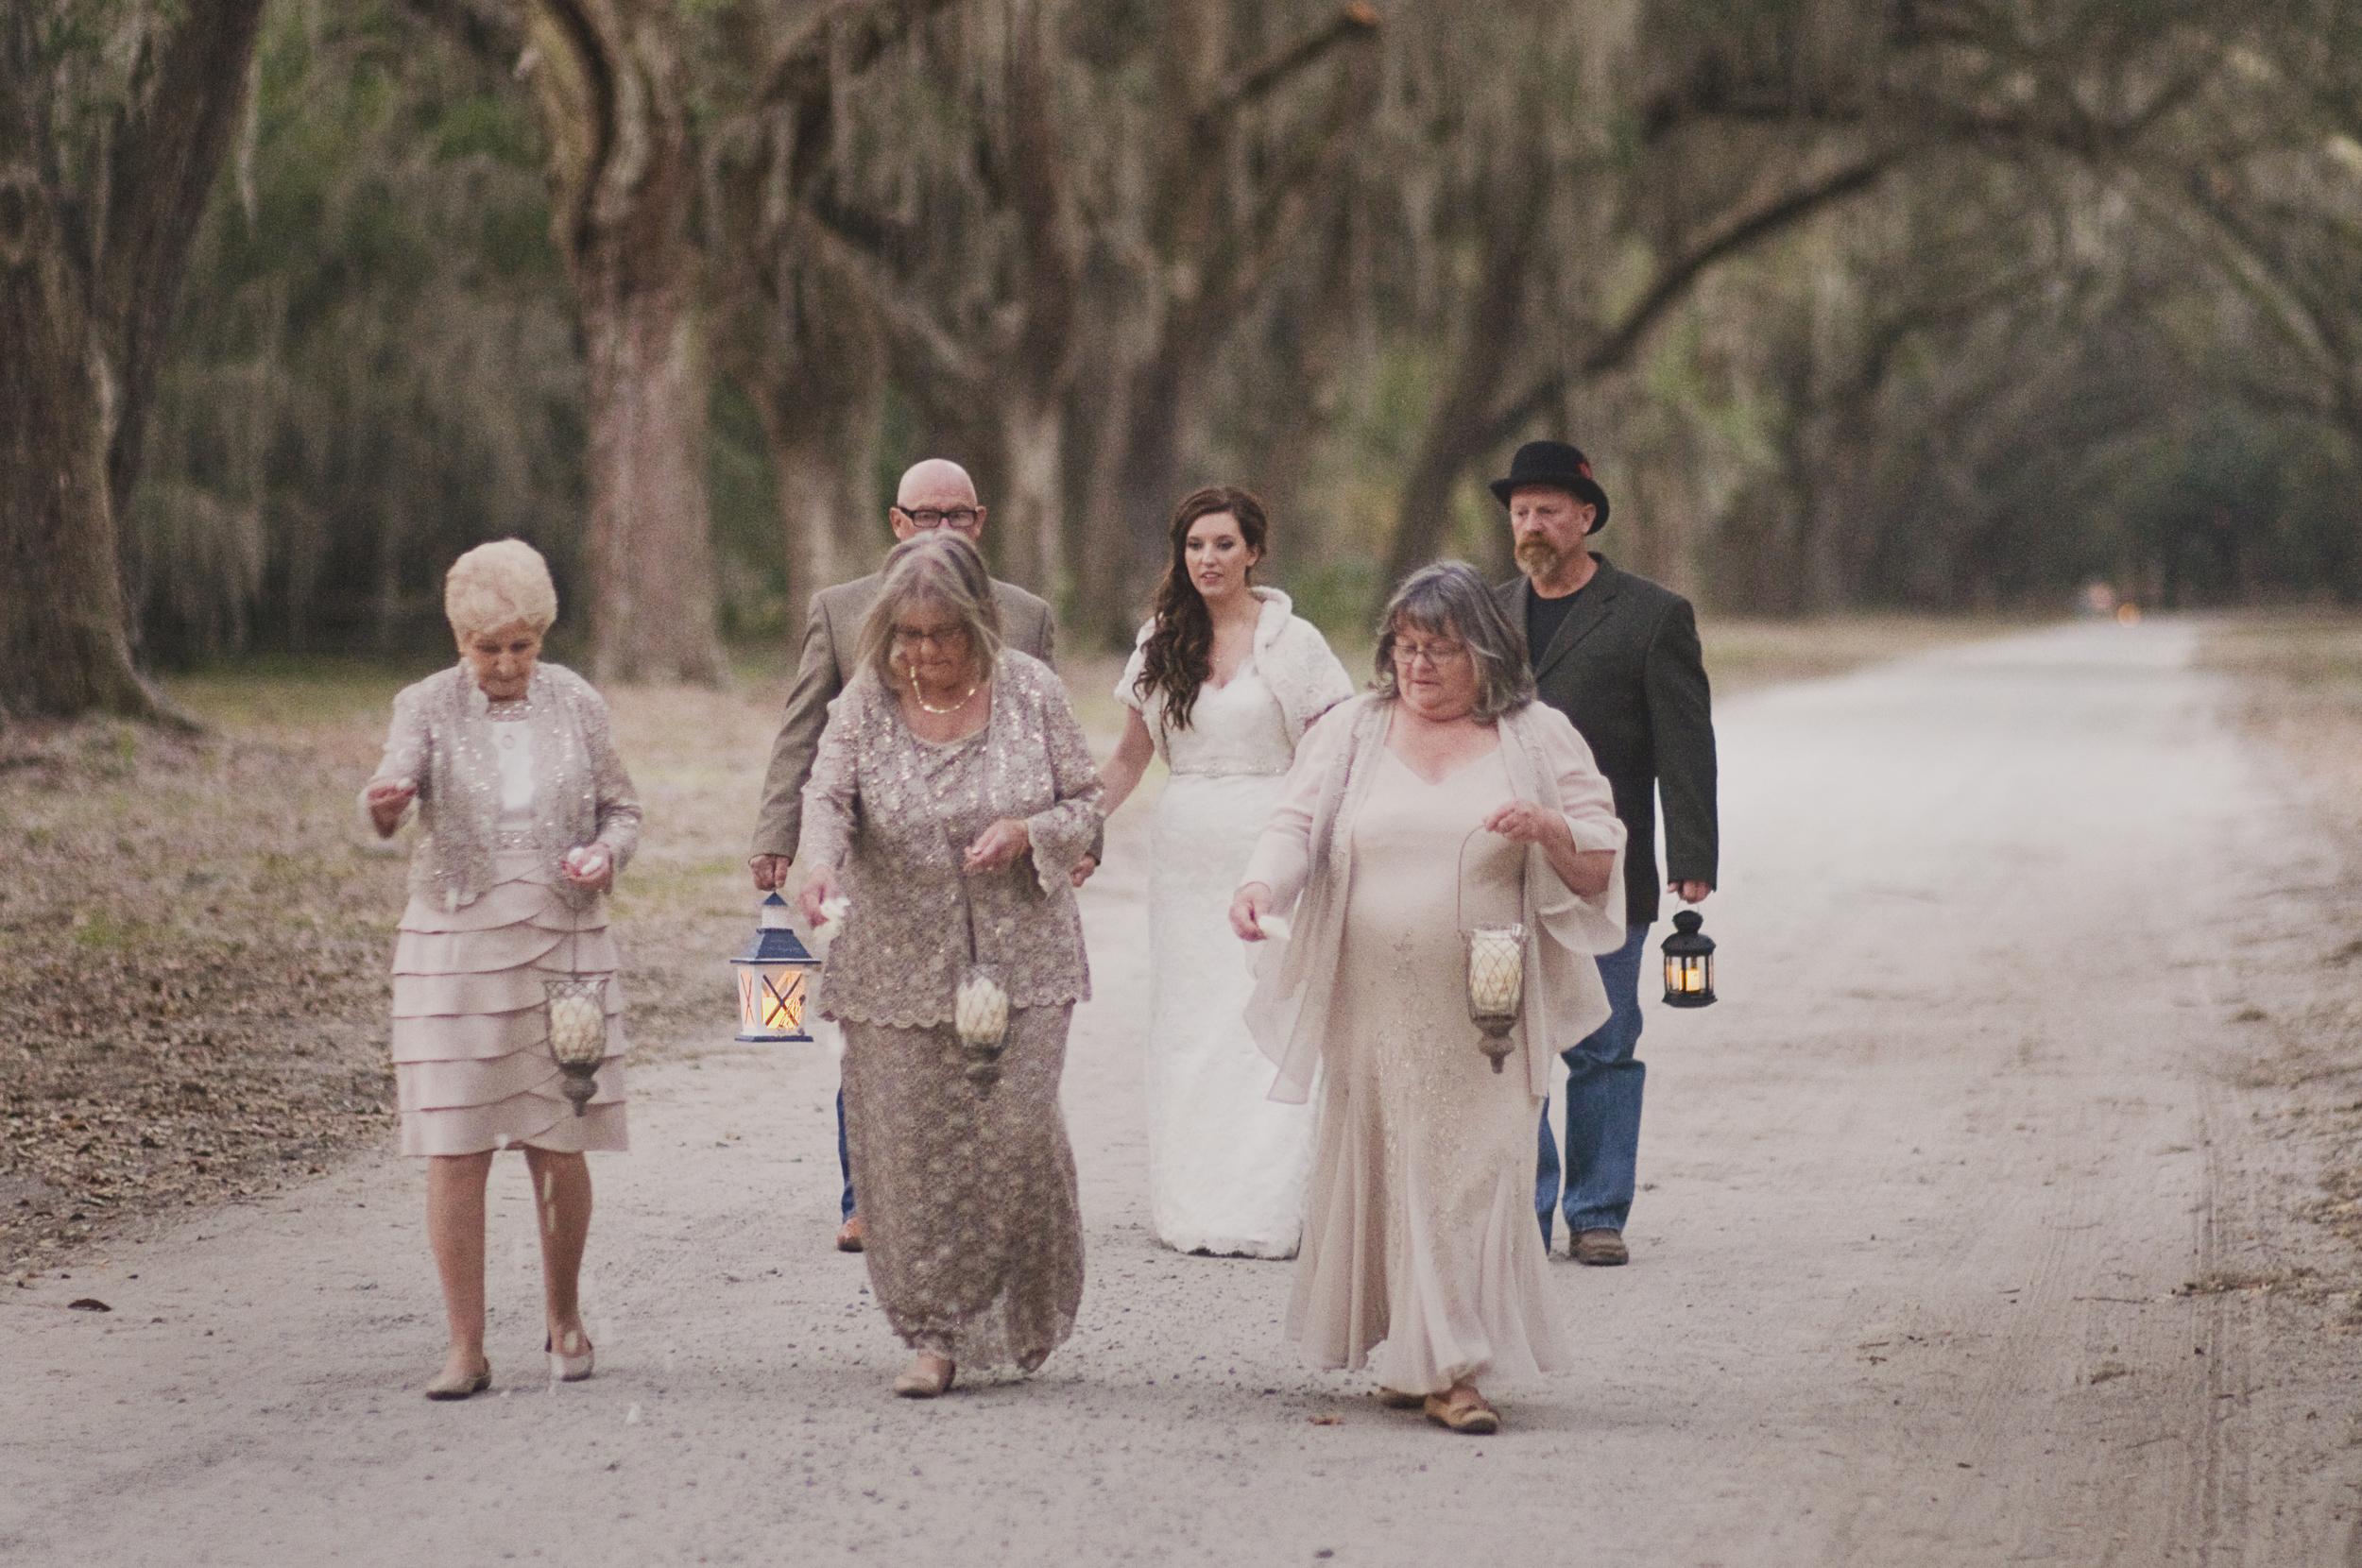 amber-and-david-ivory-and-beau-bridal-boutique-lytle-foto-savannah-wedding-dresses-savannah-wedding-planner-savannah-event-designer-savannah-weddings-wormsloe-wedding-cohens-retreat-wedding-indie-wedding-handmade-wedding-historic-29.jpg